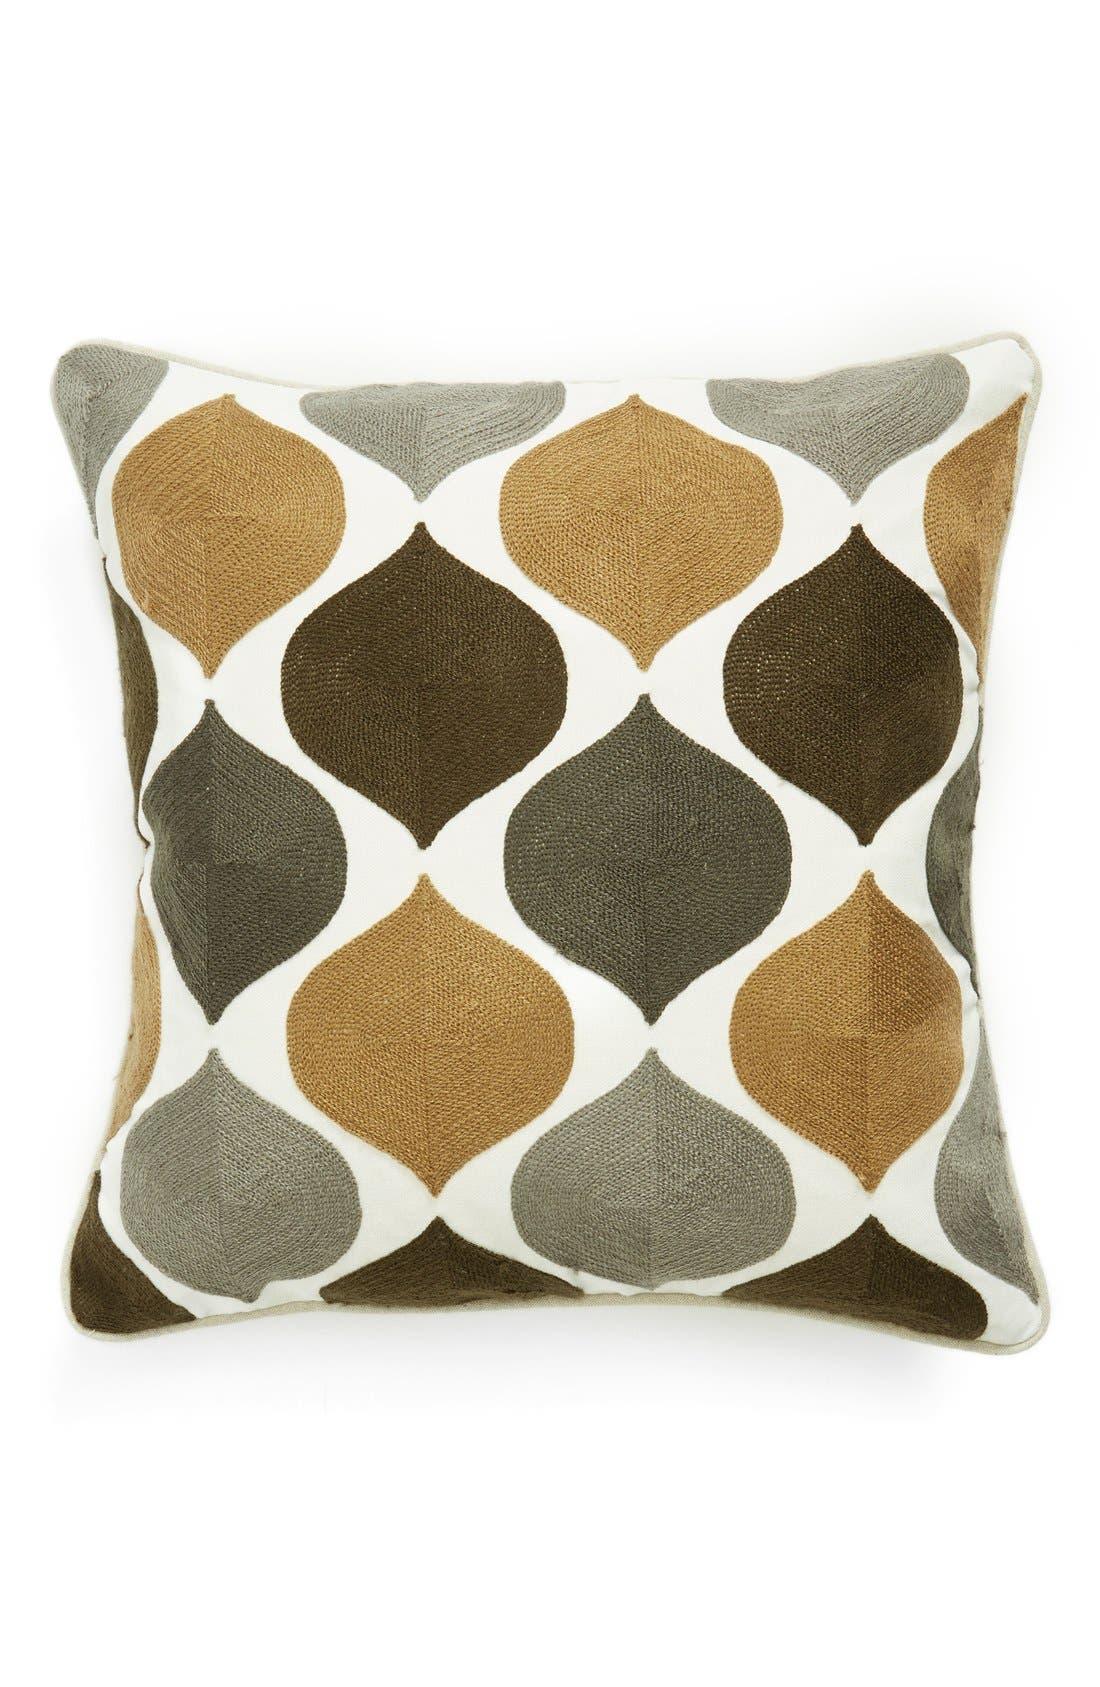 Main Image - Levtex 'Parma' Stitch Pillow